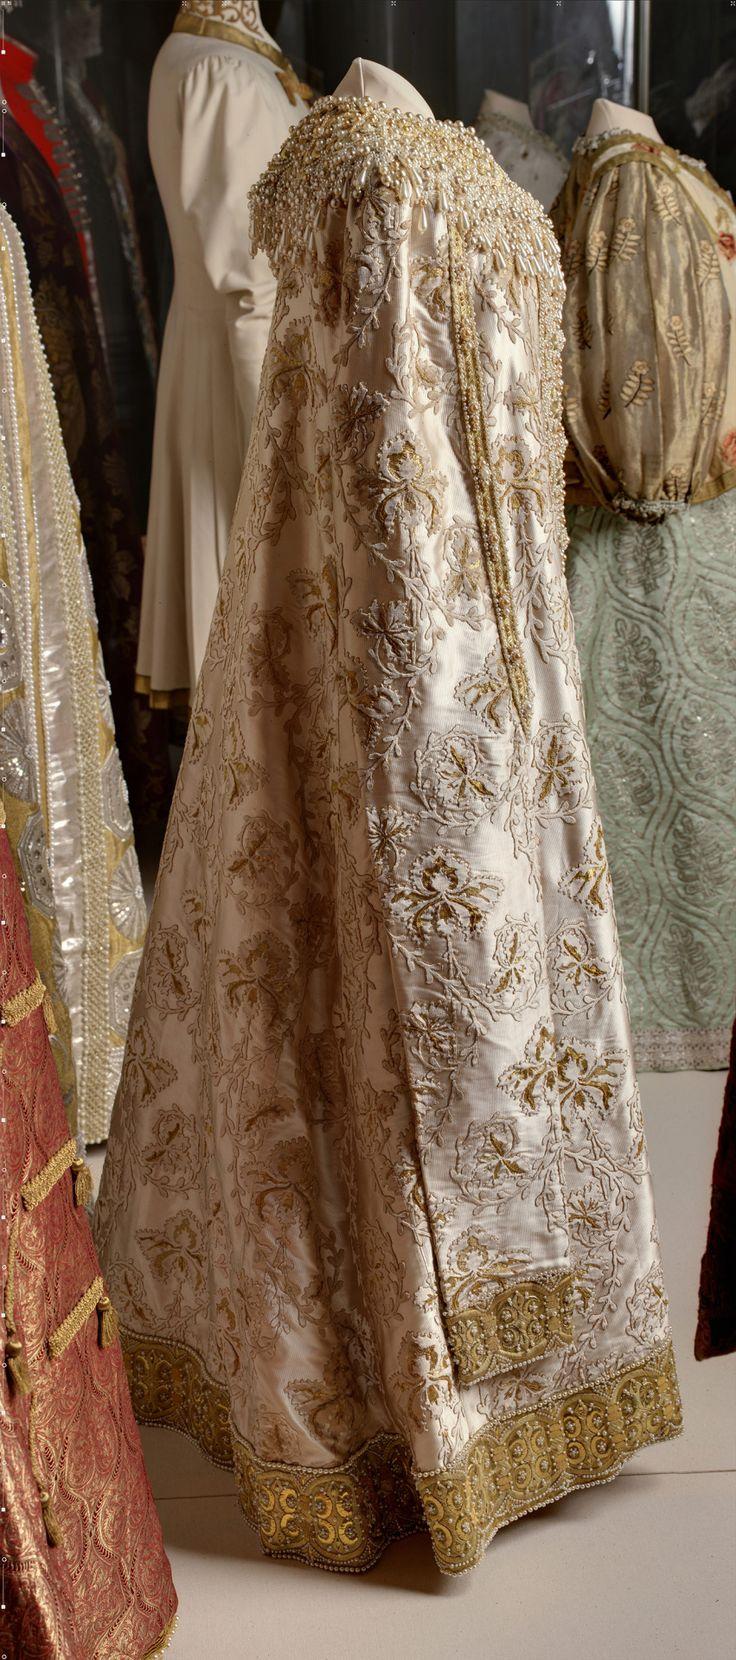 Grand Duchess Xenia Alexandrovna's Costume for the 1903 ball in the Winter…